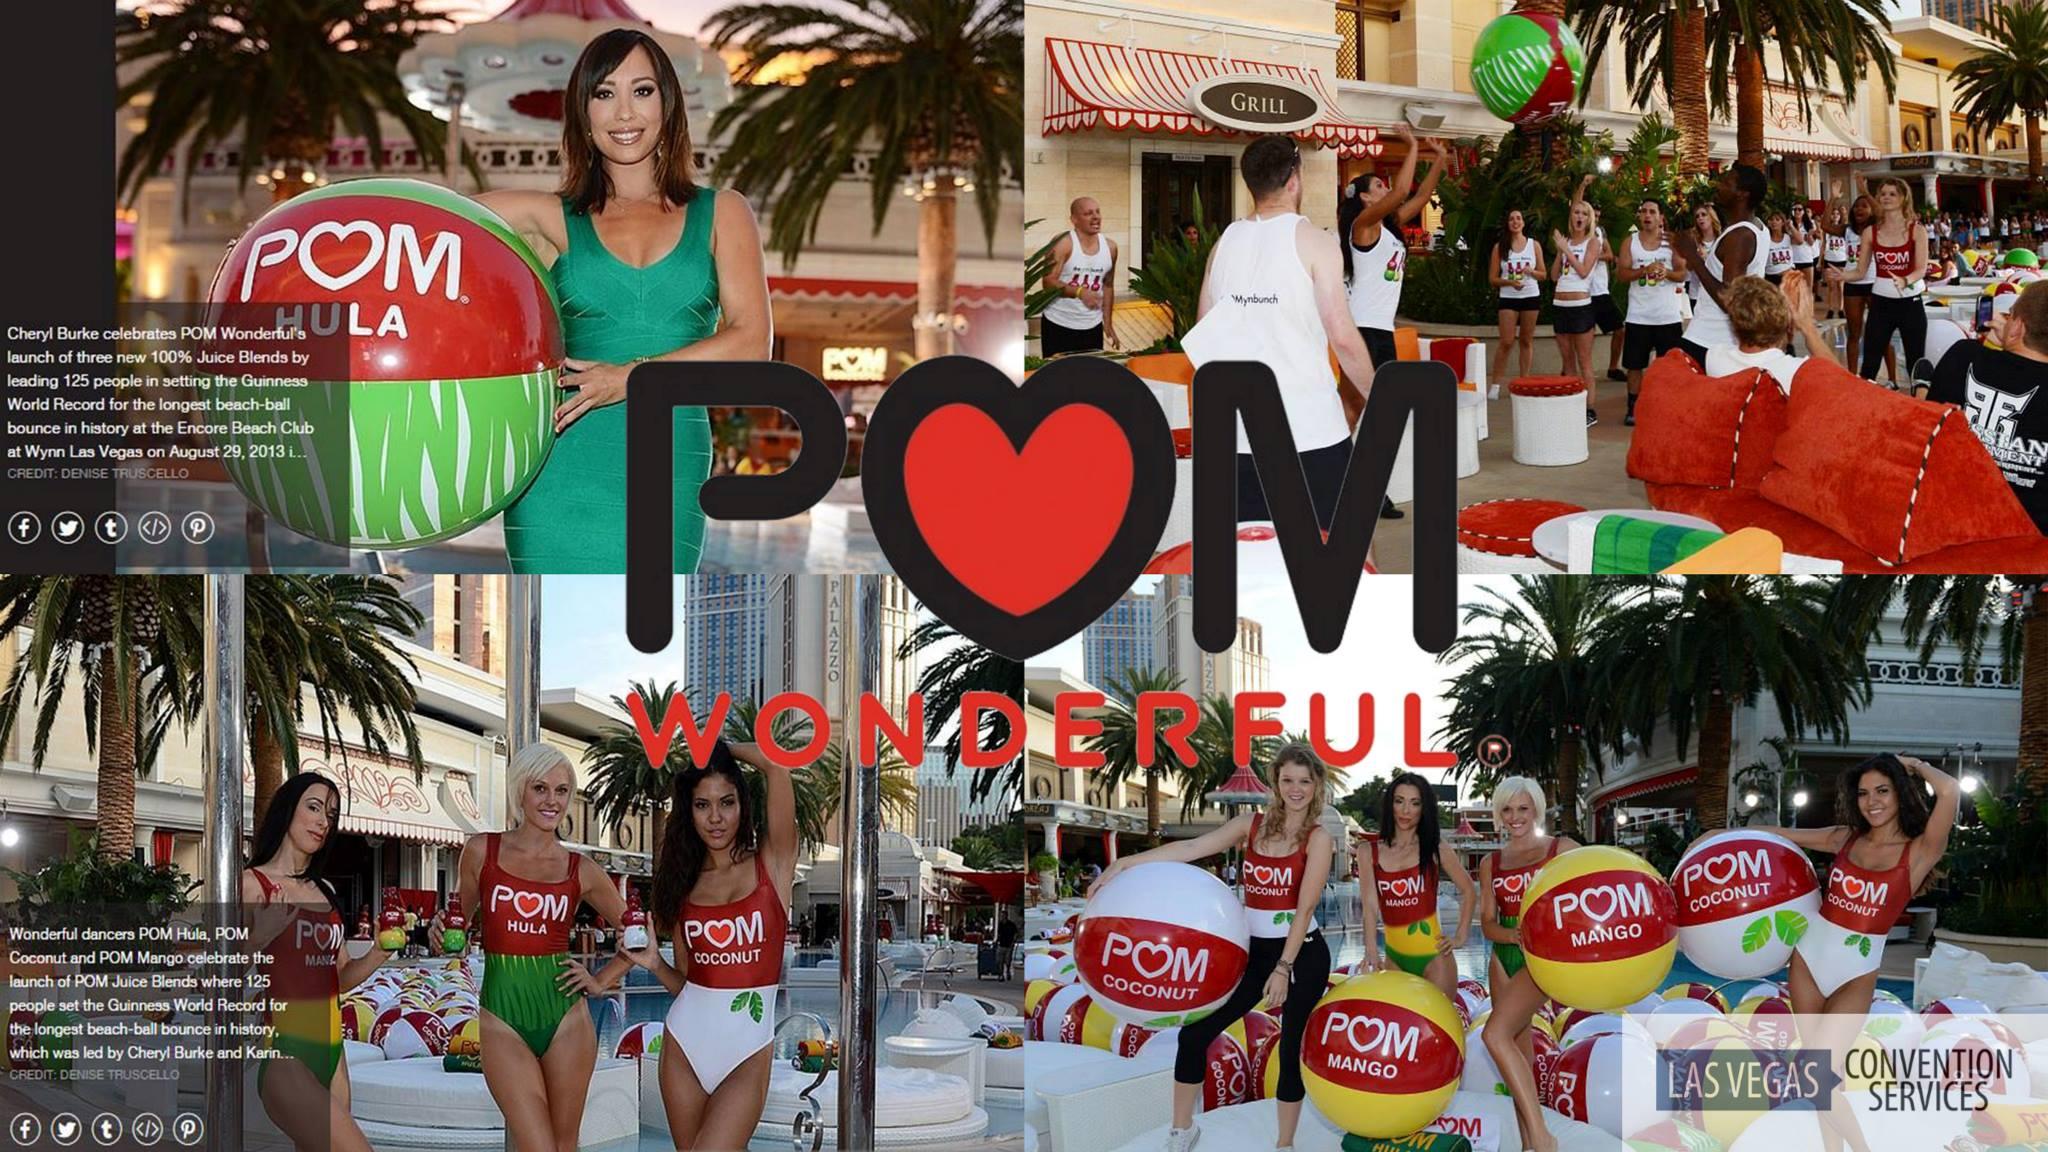 las vegas celebrities for event marketing lvcs